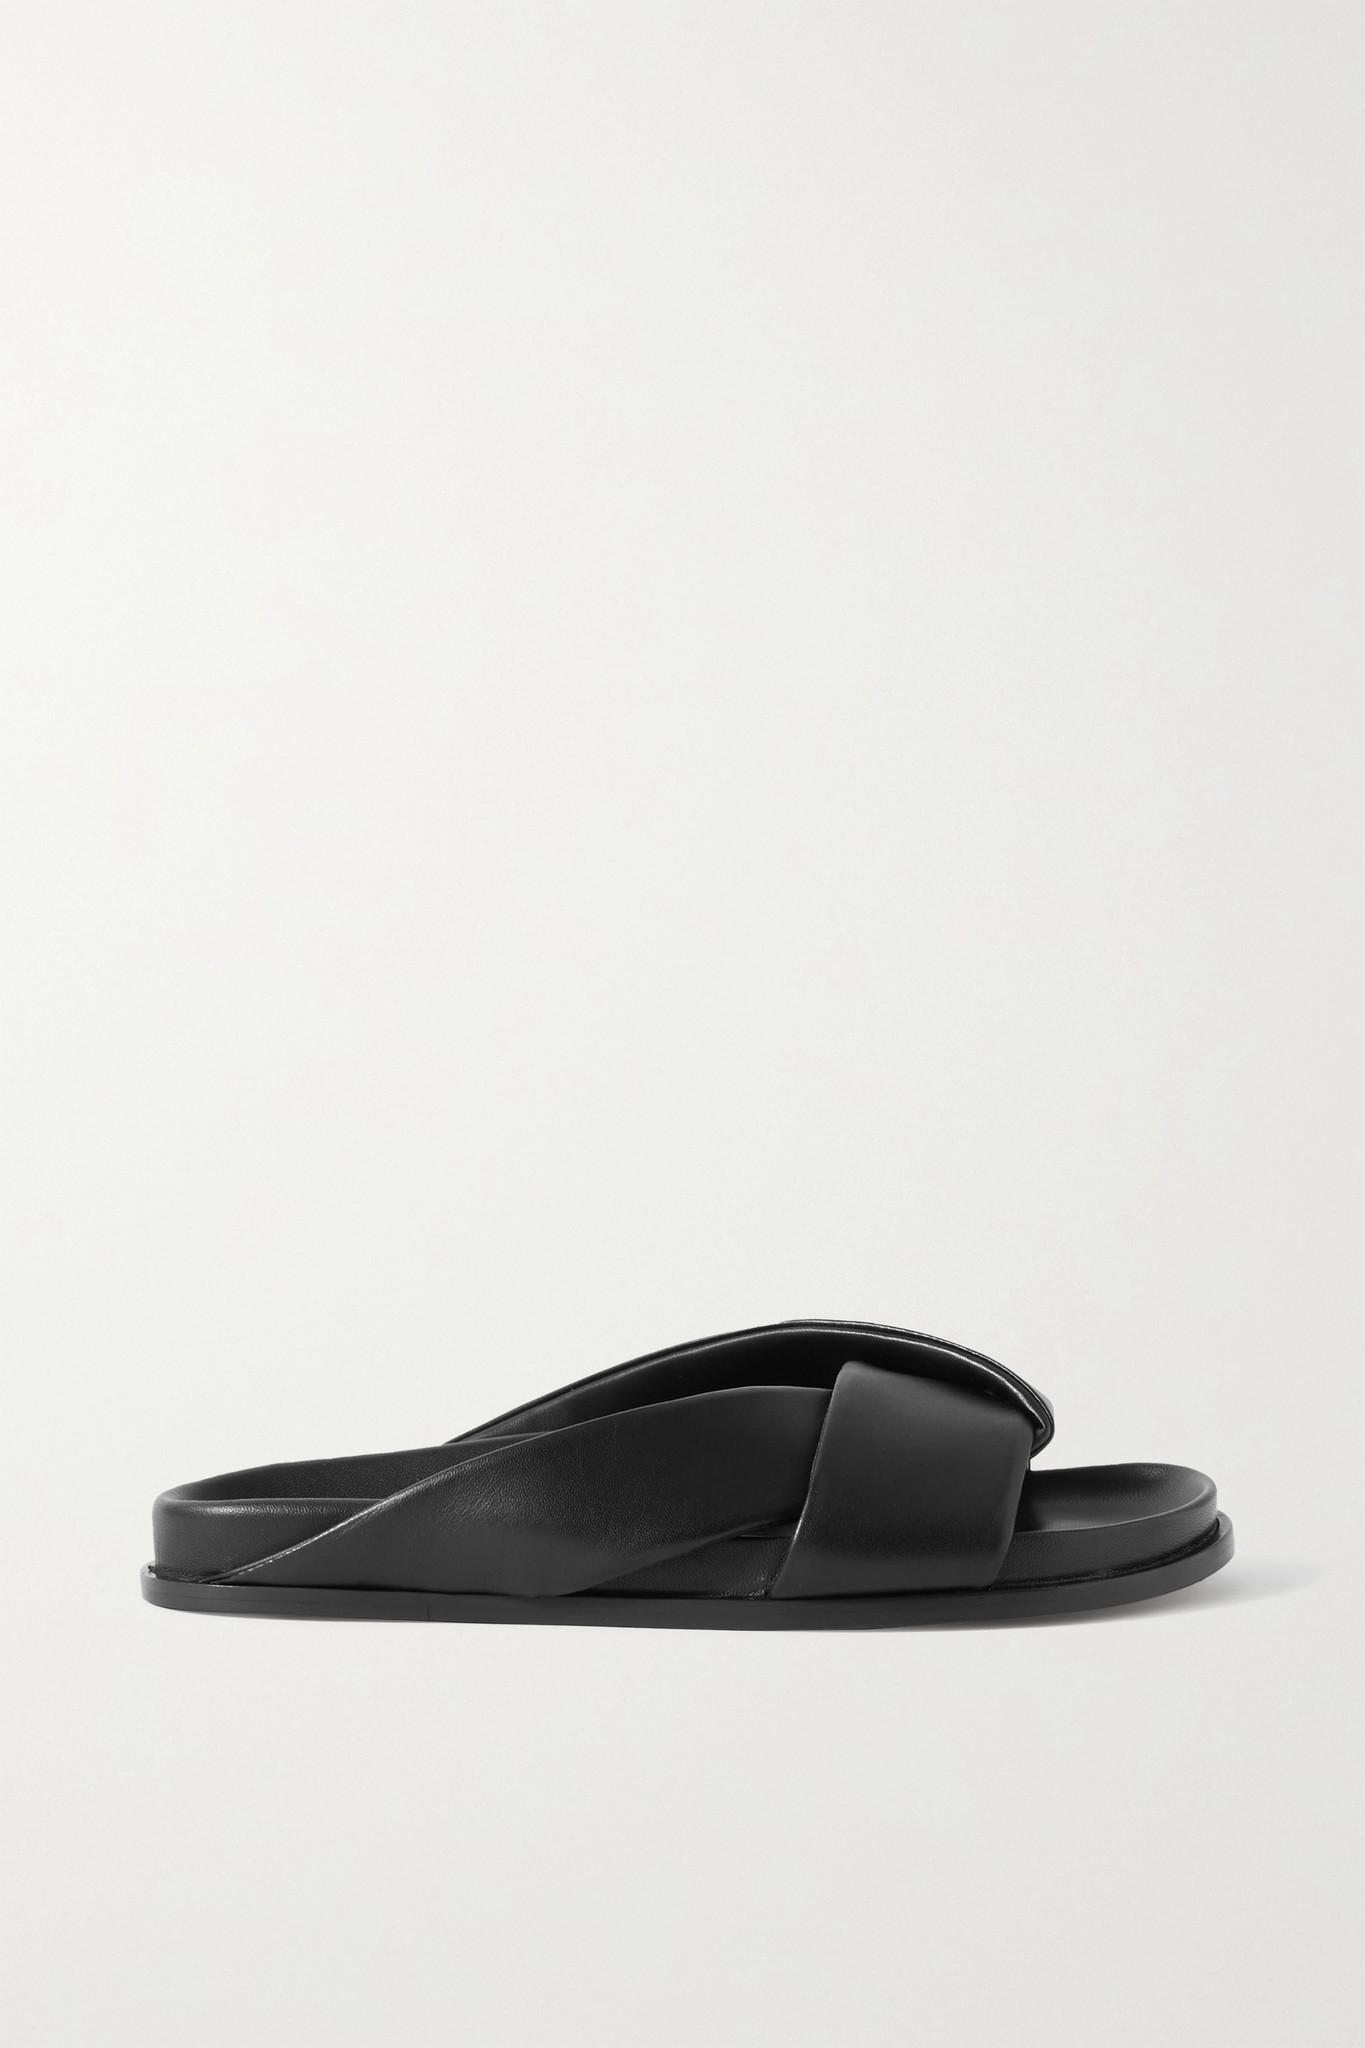 EMME PARSONS - 皮革拖鞋 - 黑色 - IT37